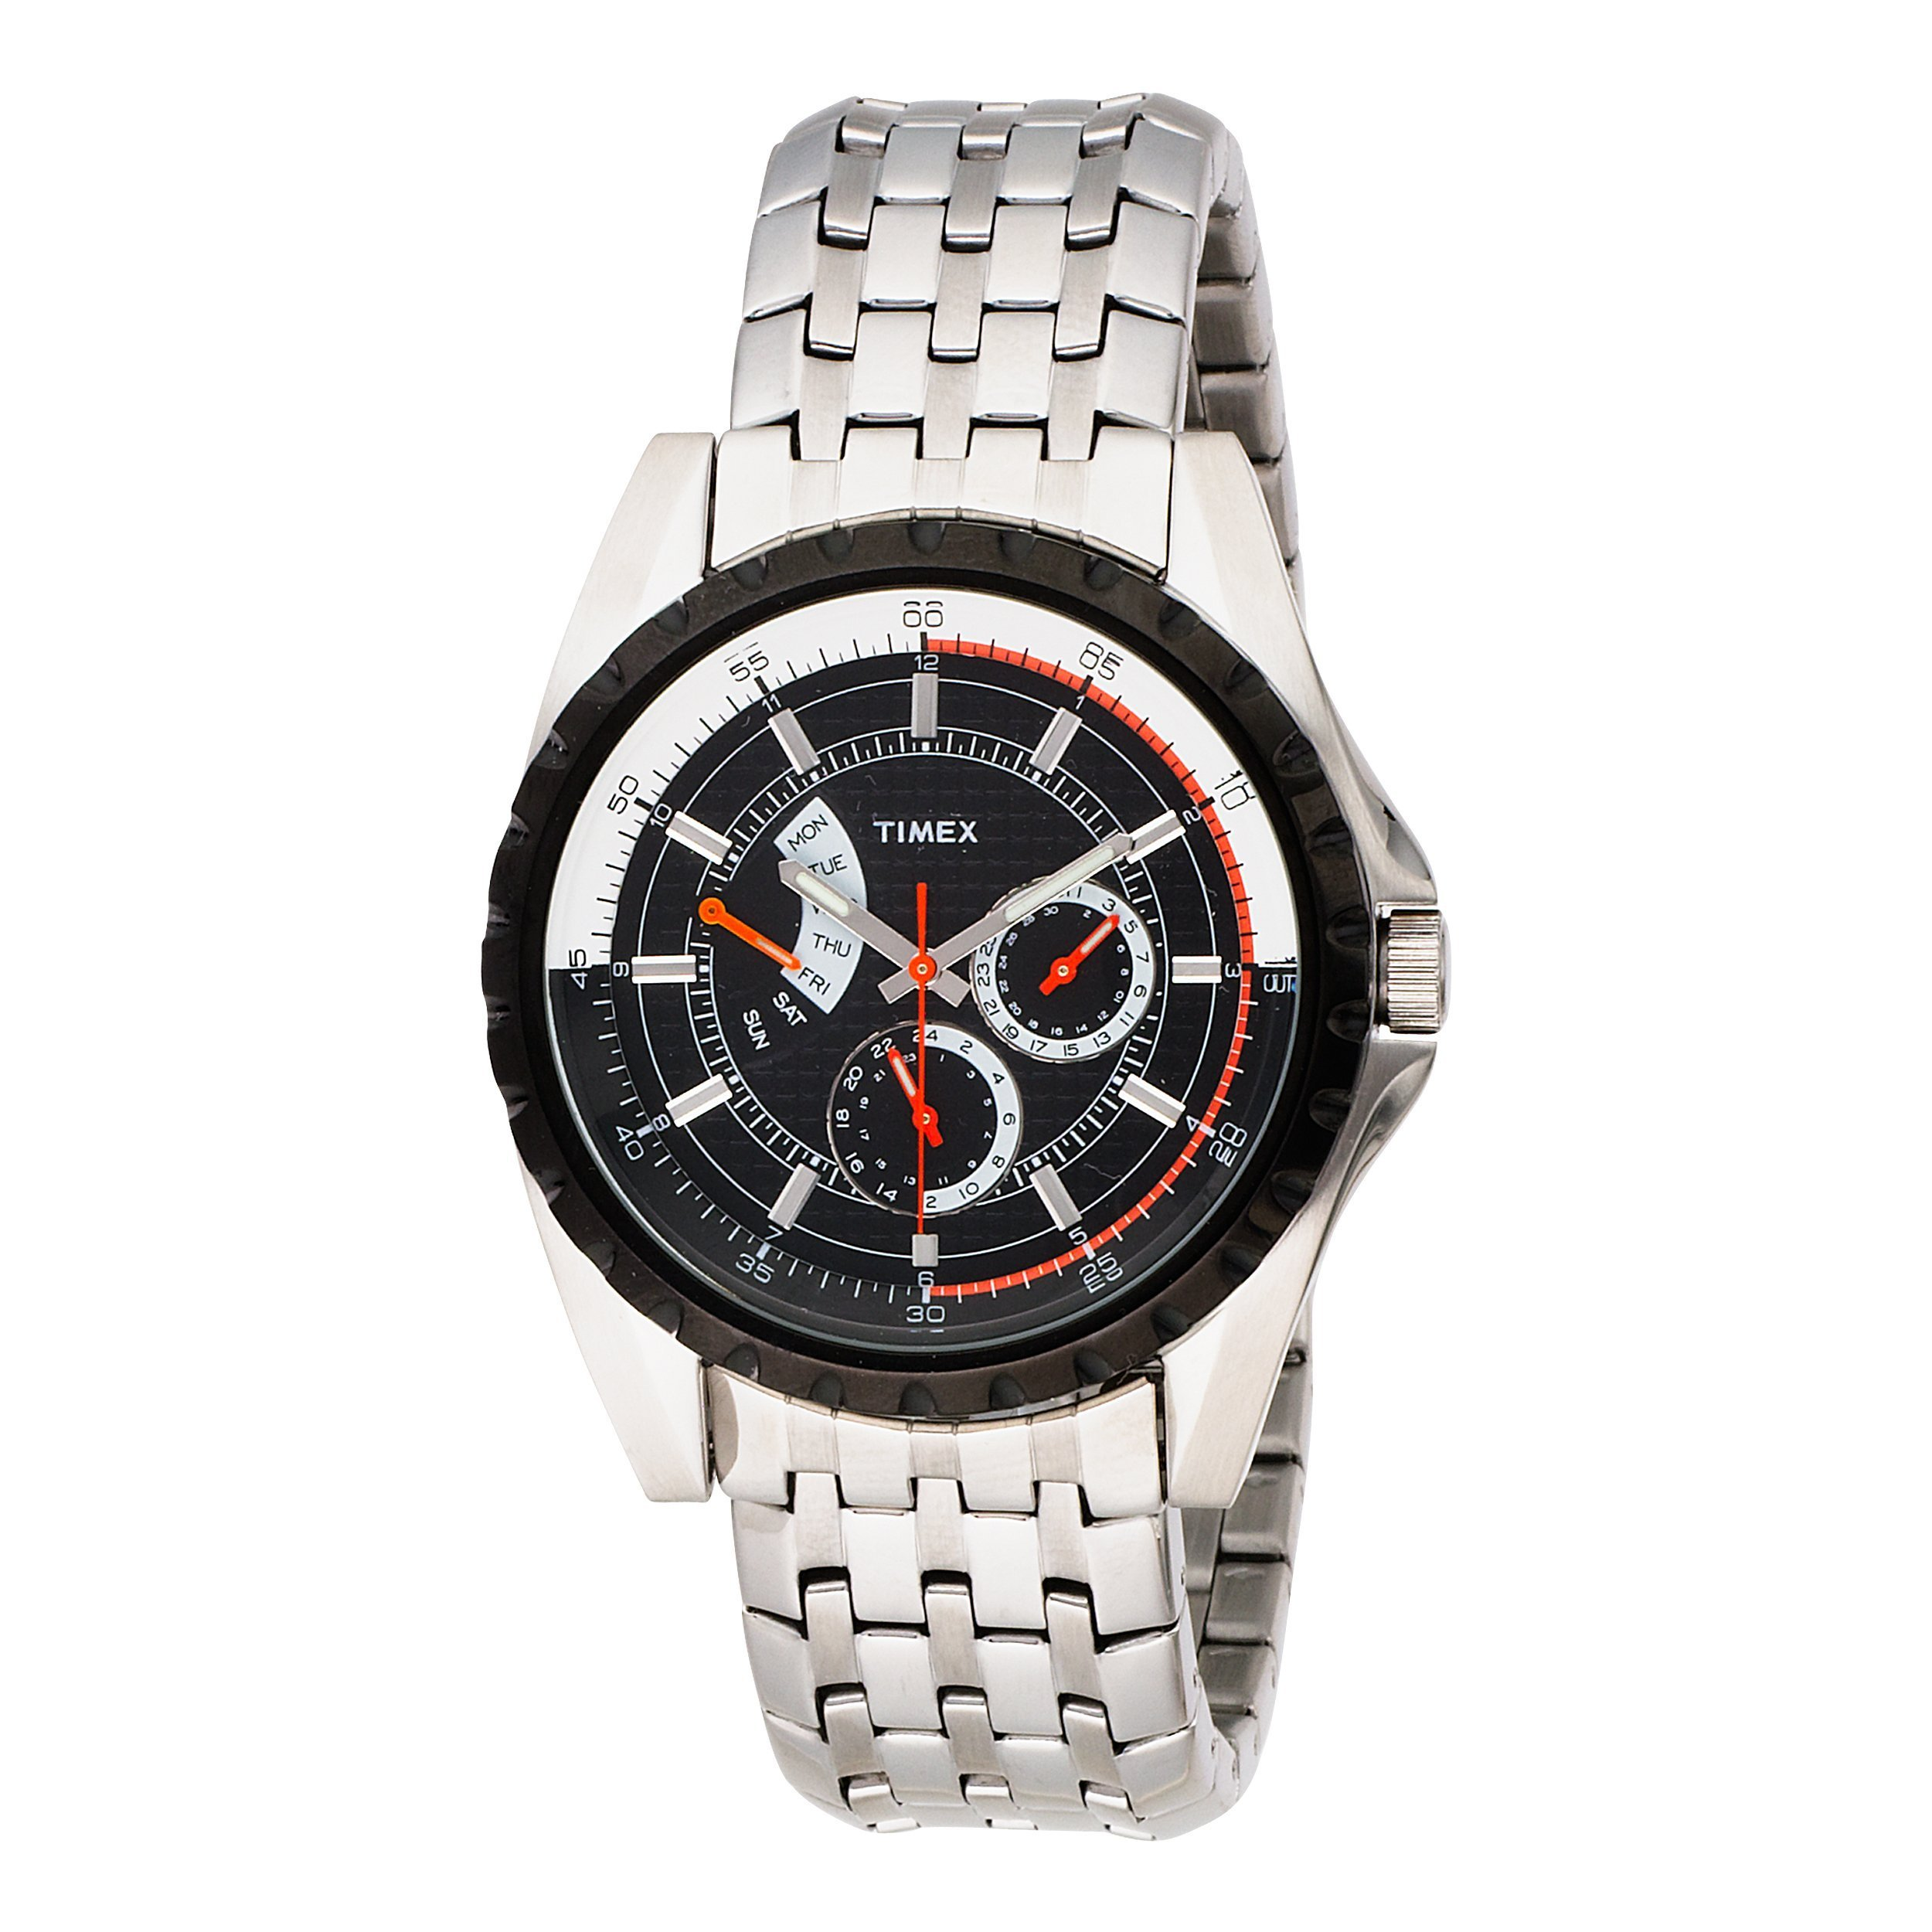 Timex Men's T2M430 Premium Collection Retrograde Chronograph Stainless Steel Bracelet Watch